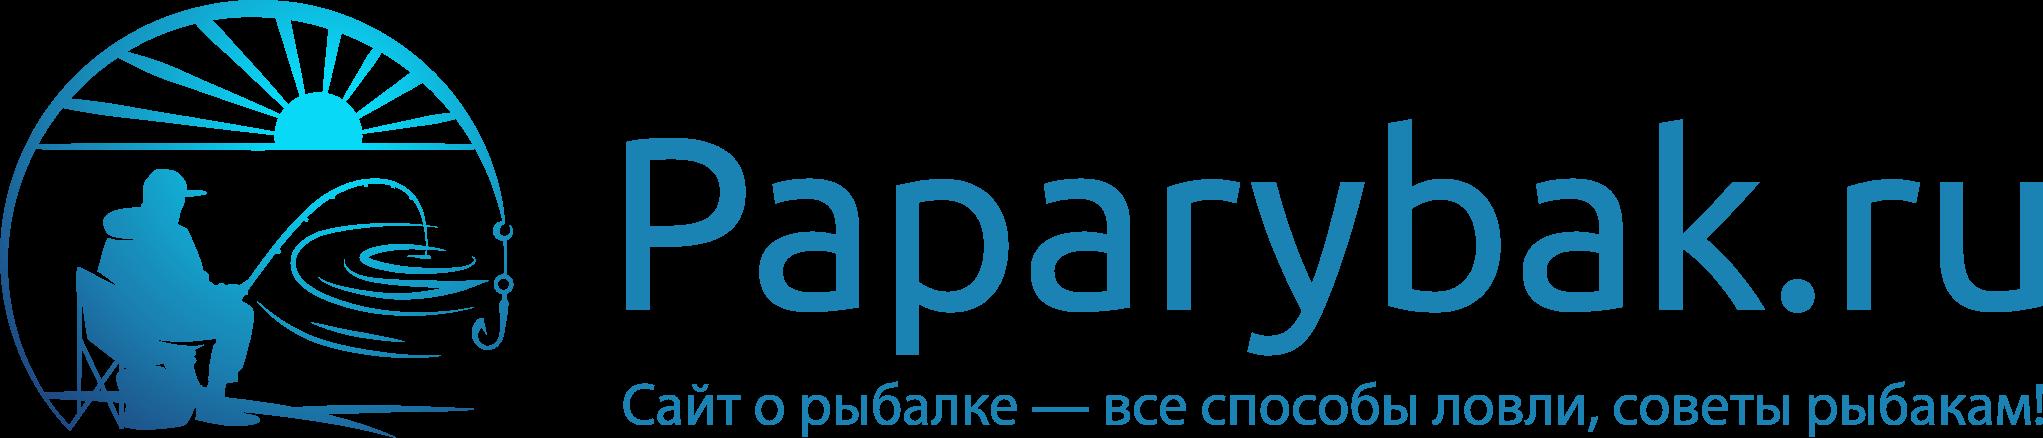 Paparybak.ru